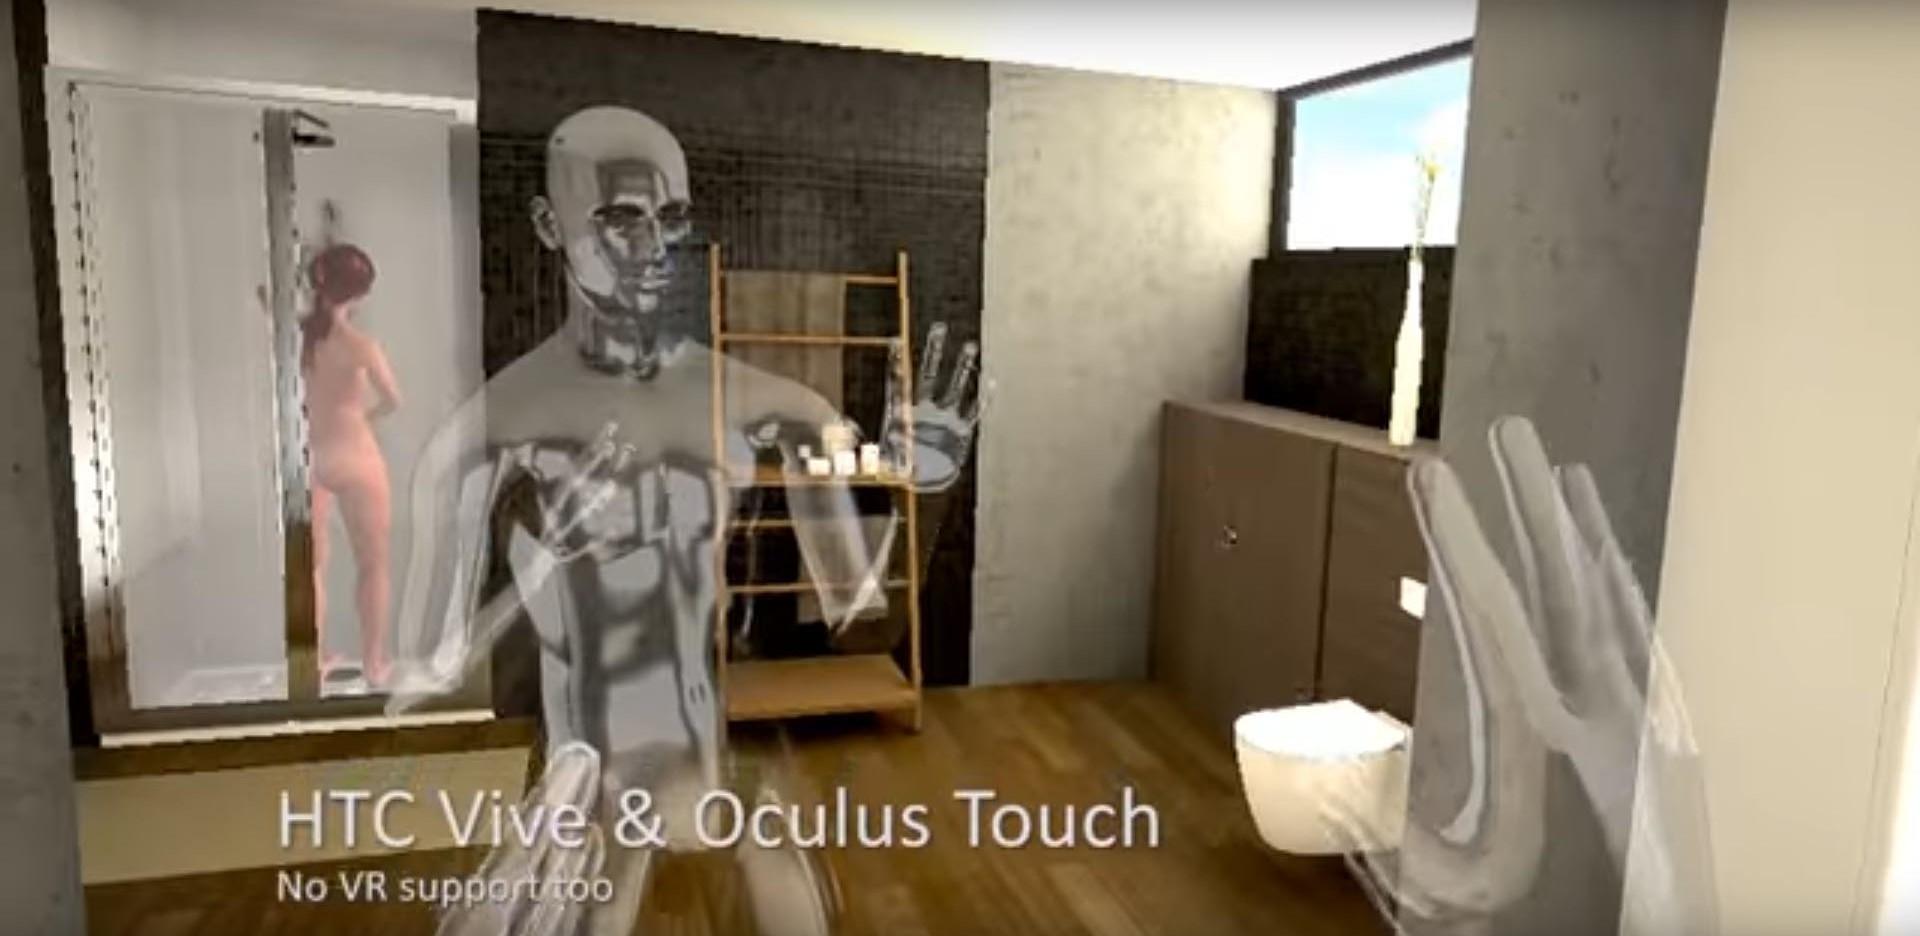 la douche adult game review znelarts vr porn blog virtual reality